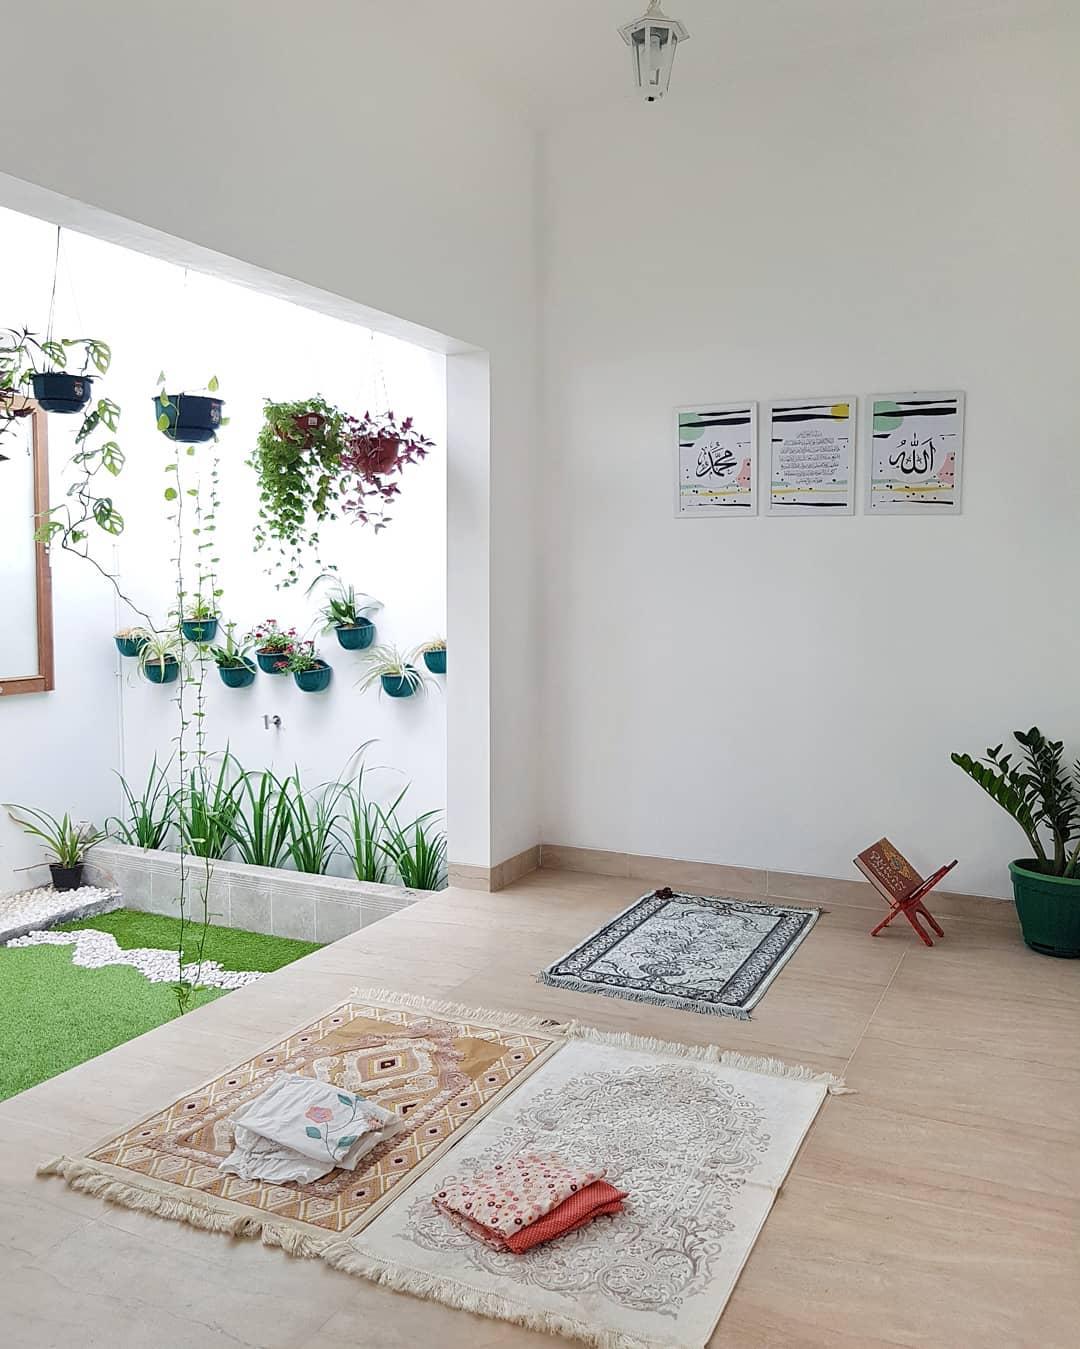 Gambar Desain Mushola Minimalis Dalam Rumah Menyatu Dengan Taman